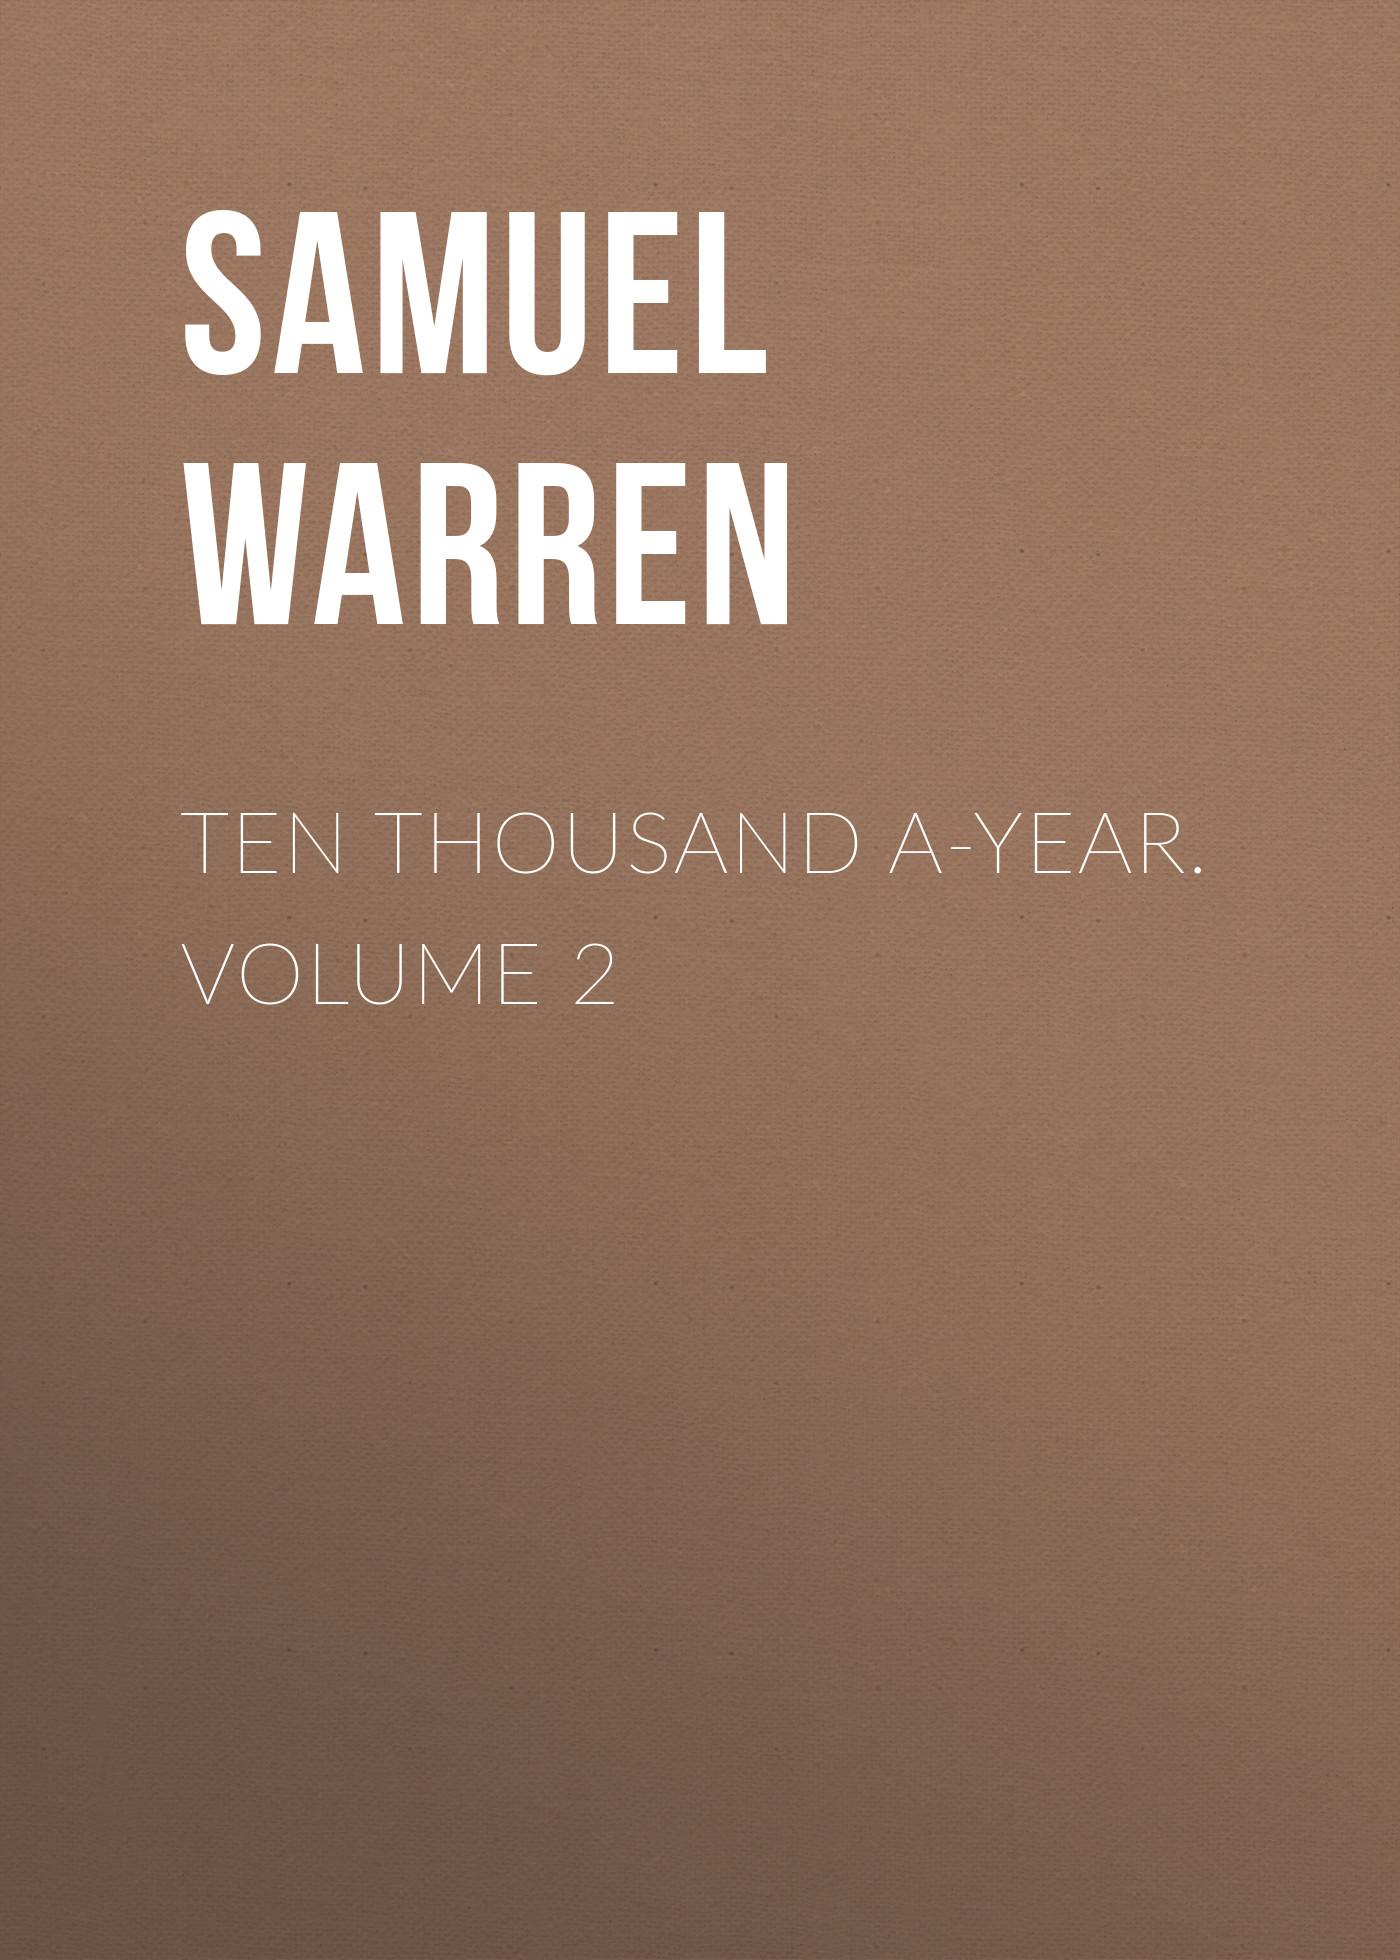 Samuel Warren Ten Thousand a-Year. Volume 2 ten wow 188g 2 page 2